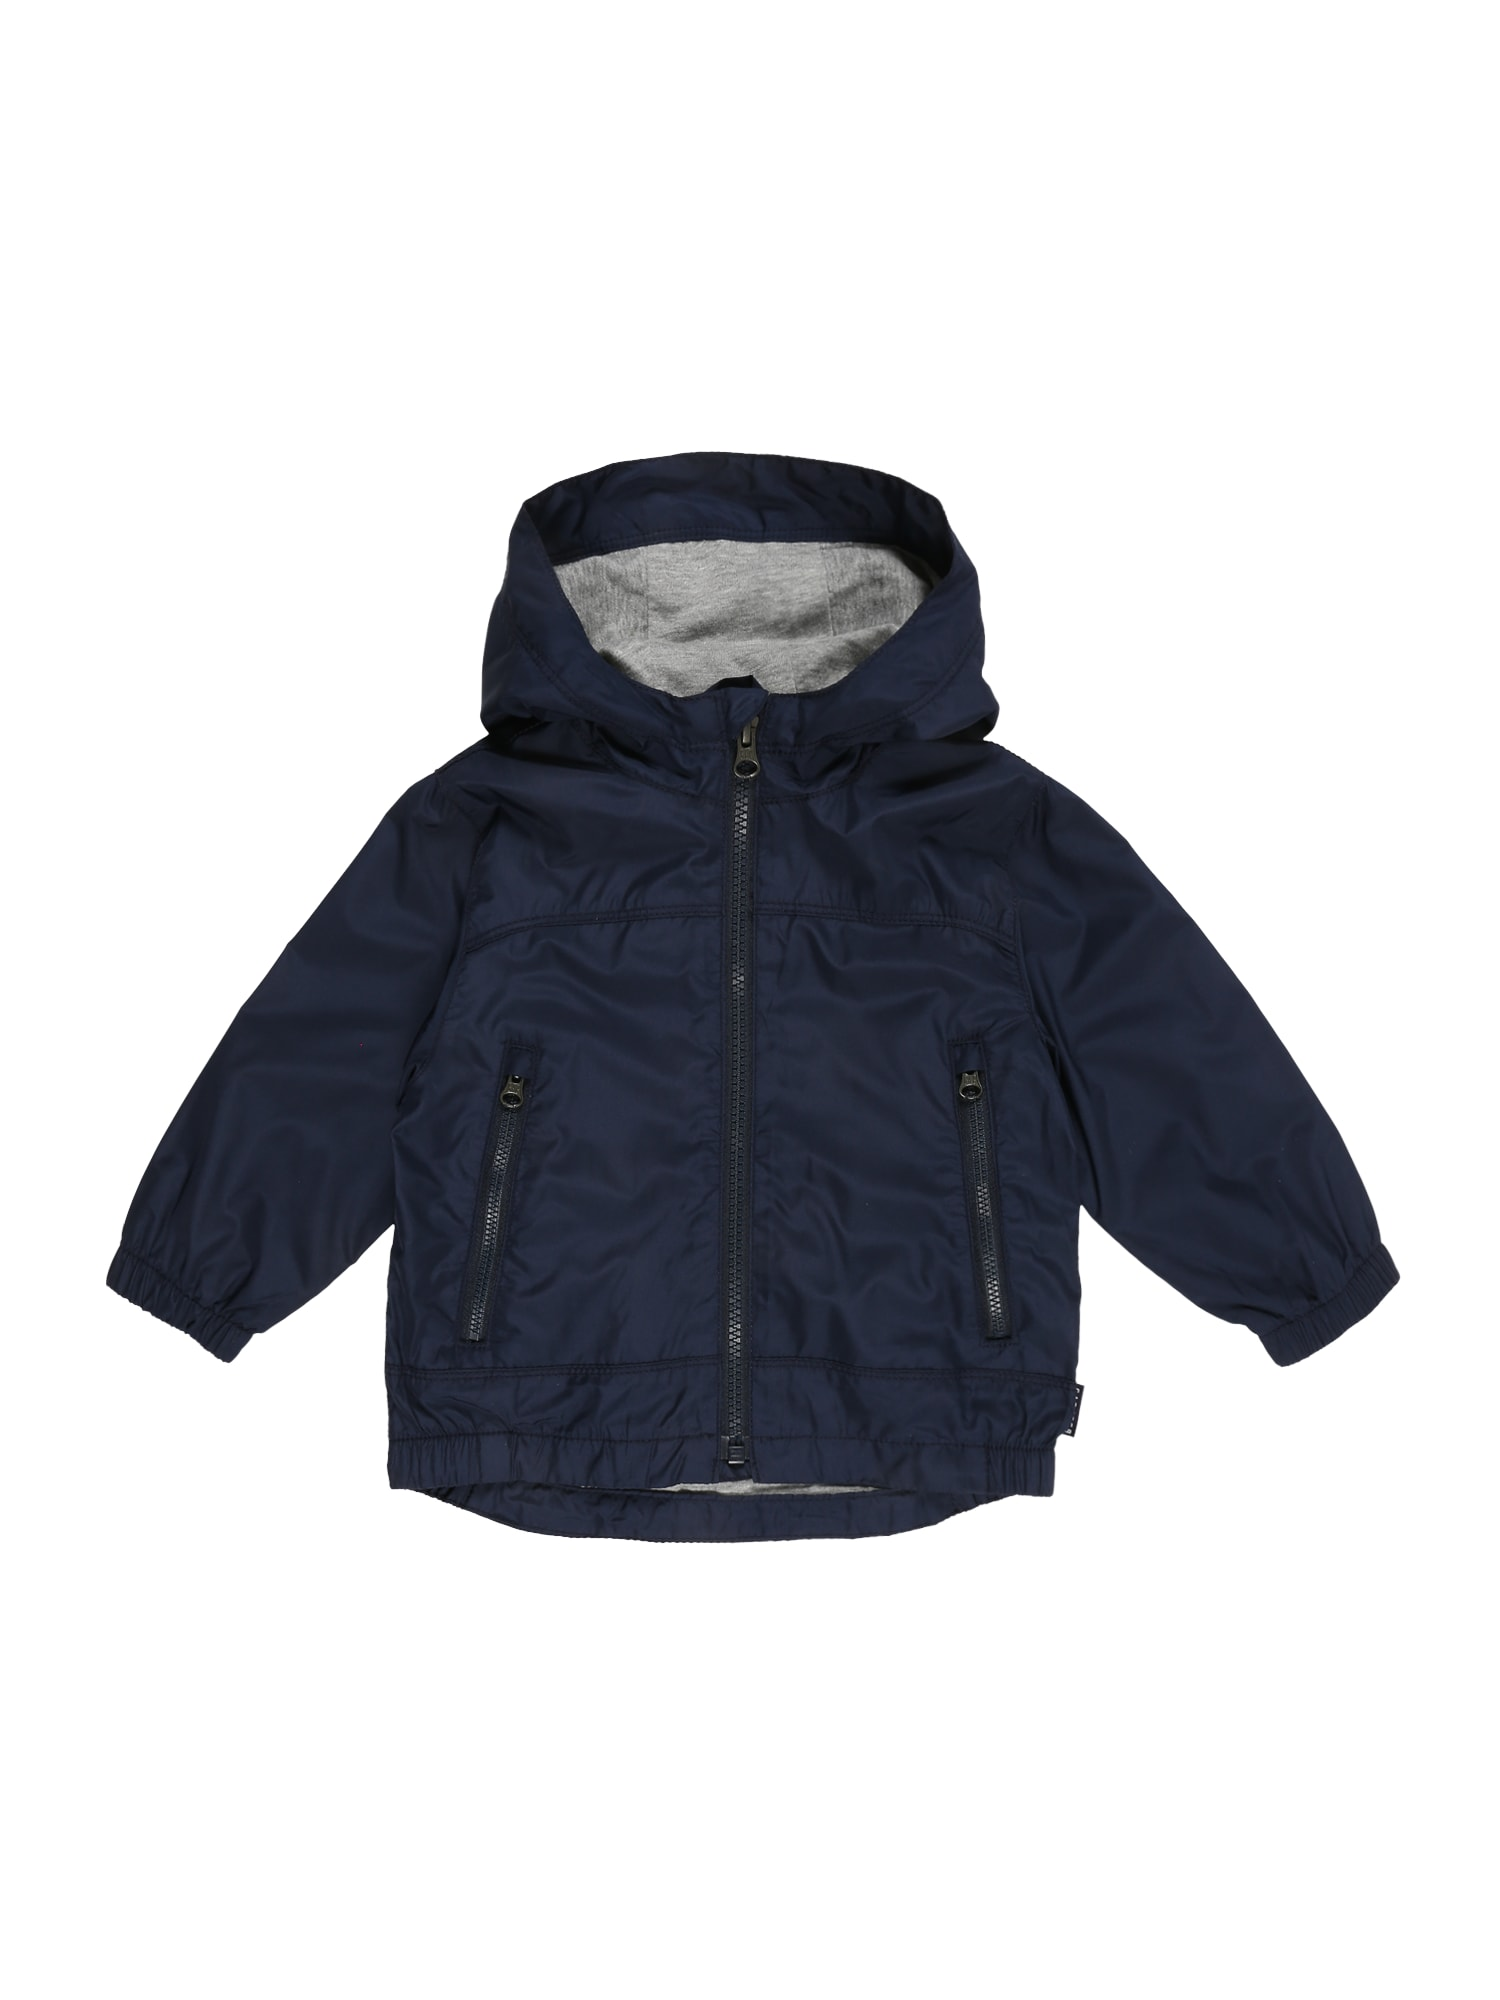 - GAP Kinder,Jungen Übergangsjacke mit Jersey-Futter blau | 00500016189947